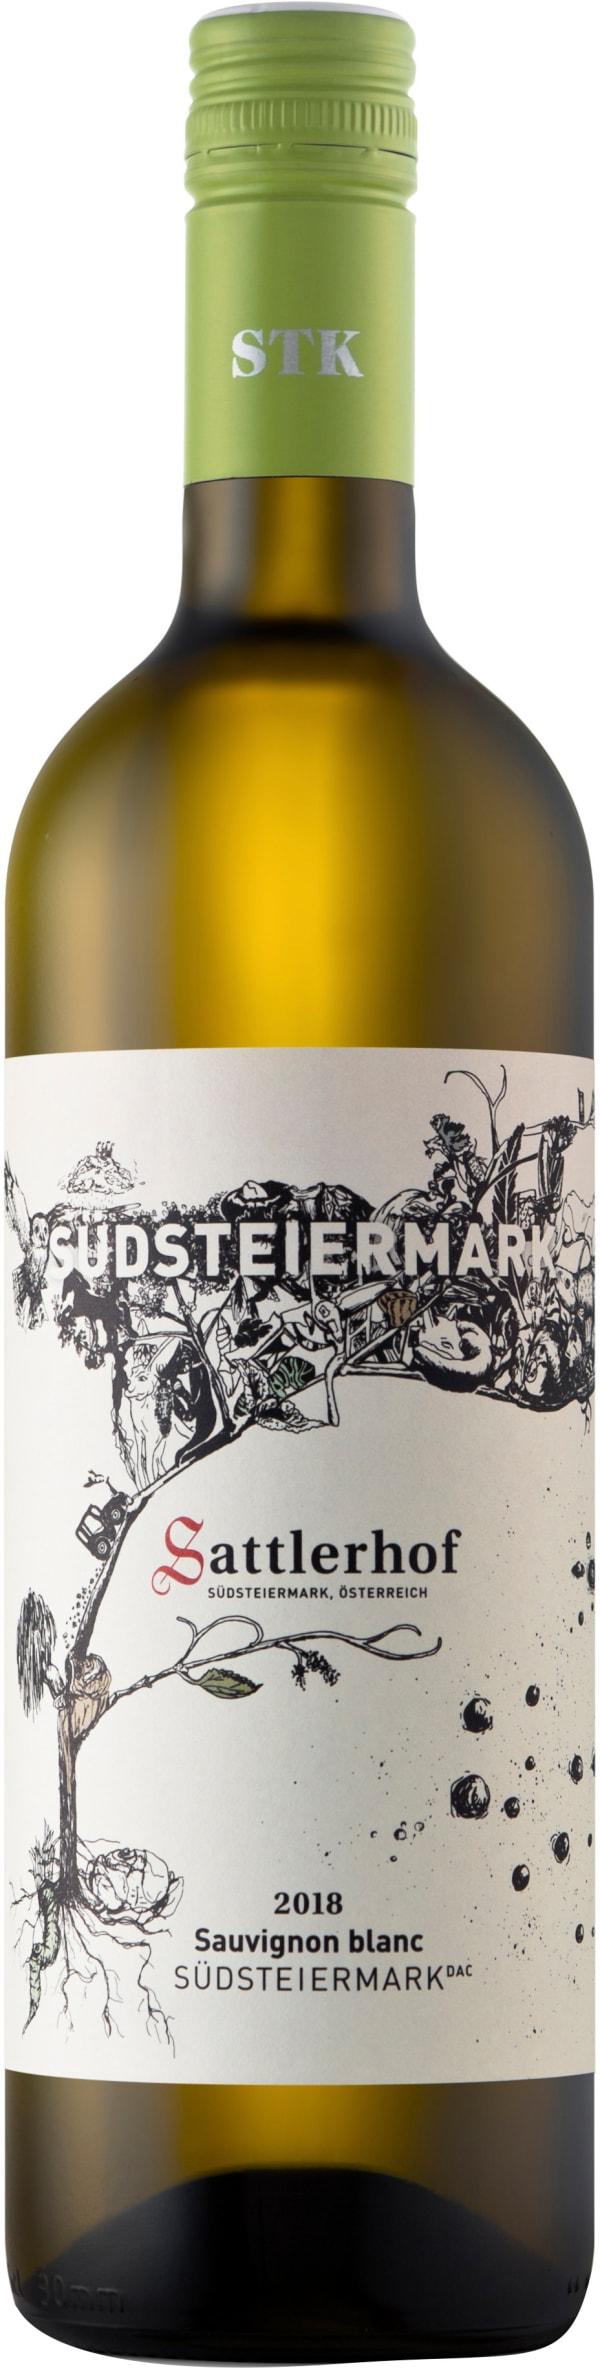 Sattlerhof Südsteiermark Sauvignon Blanc 2018